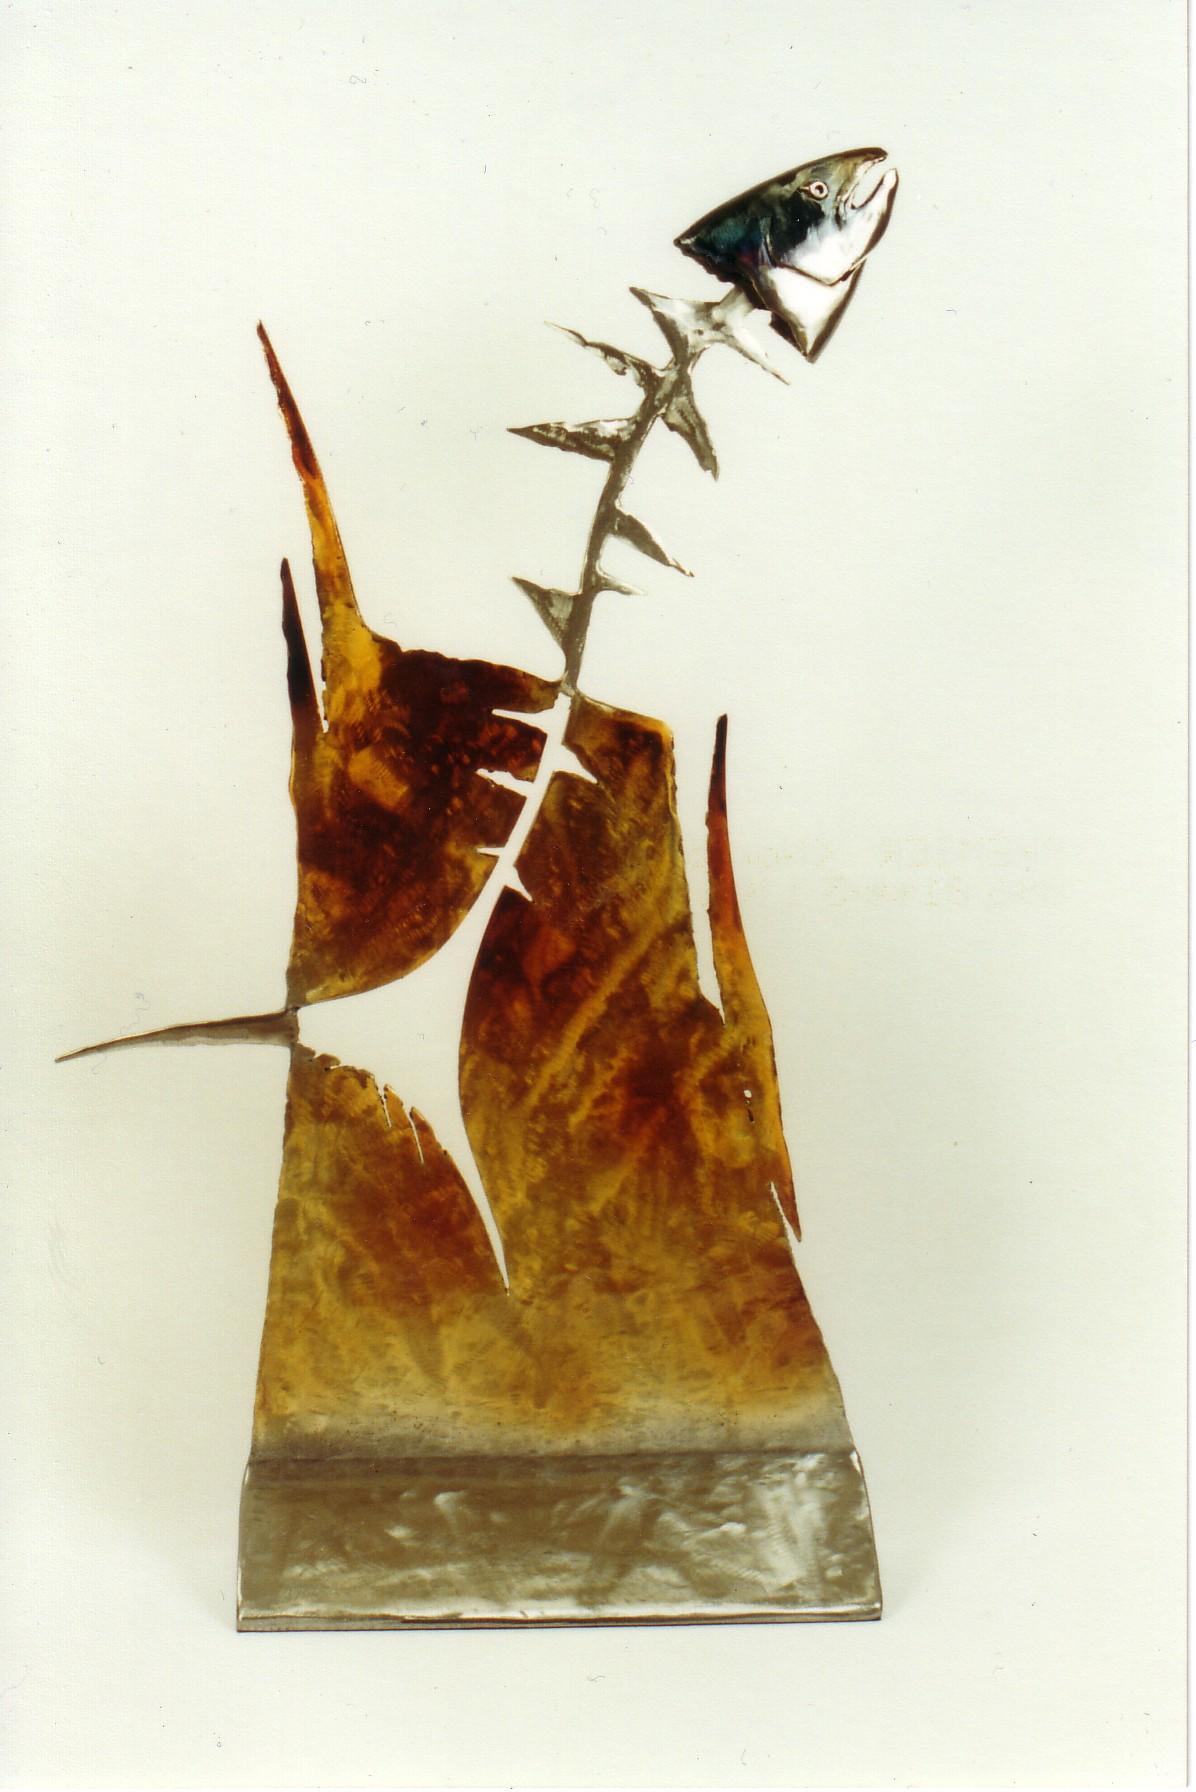 BURREN BRADAN (2004)